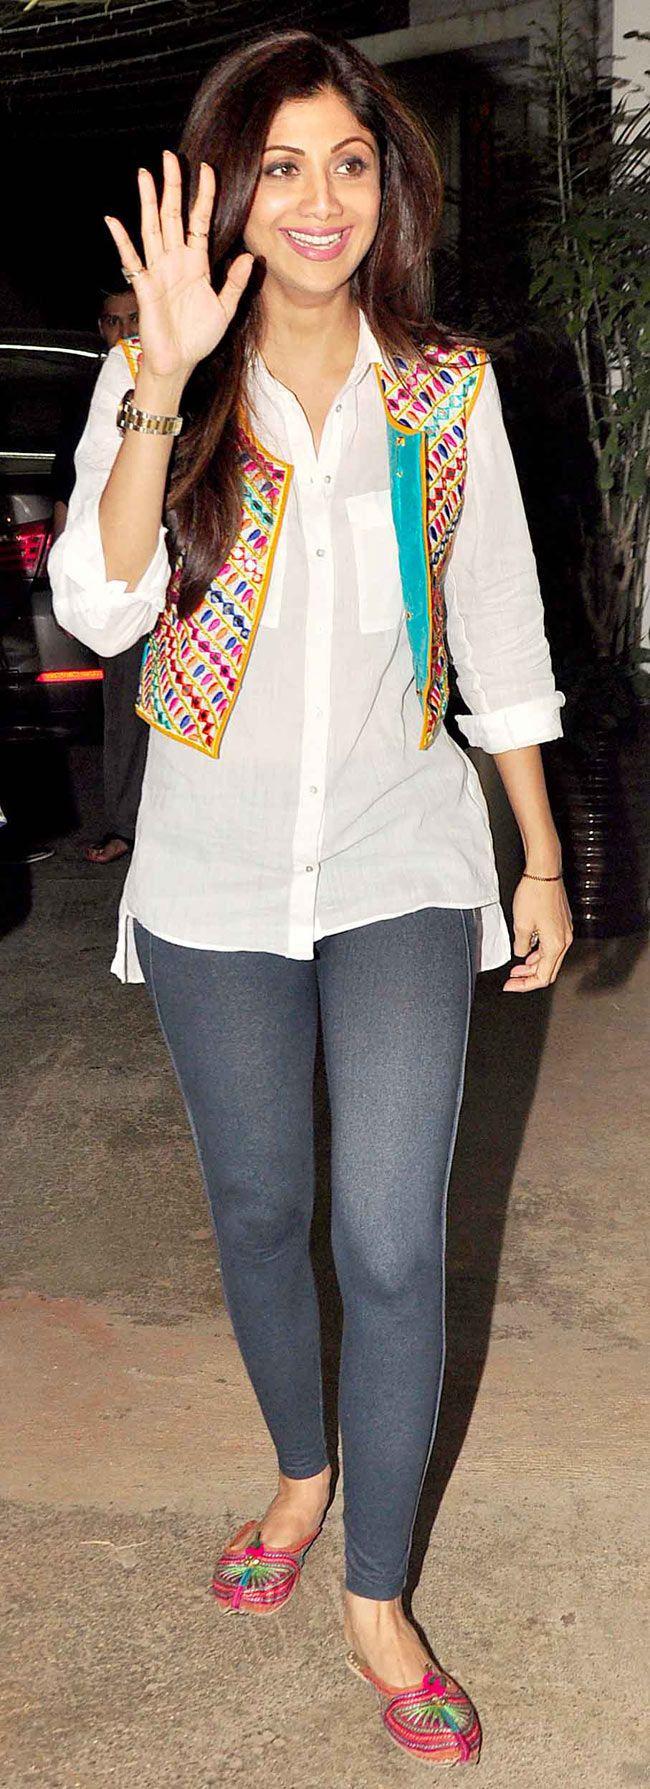 Shilpa Shetty at the screening of 'Chaar Sahibzaade'. #Bollywood #Fashion #Style #Beauty